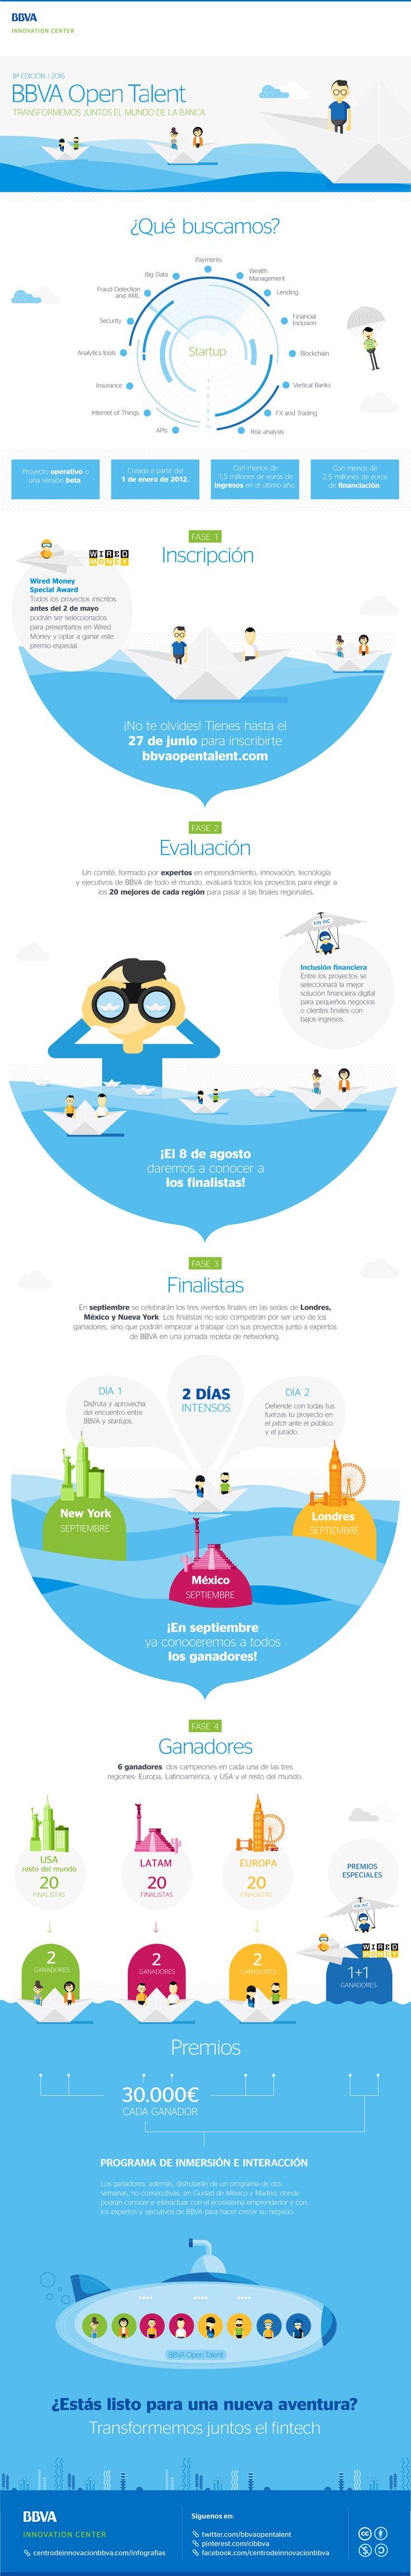 Infografía: Así funciona OpenTalent 2016  #BBVAinfographics #BBVA #Infographics #Infografía #Fintech #Tech #Financial #startups #BigData #Bitcoin #Startup #Competition #tecnología